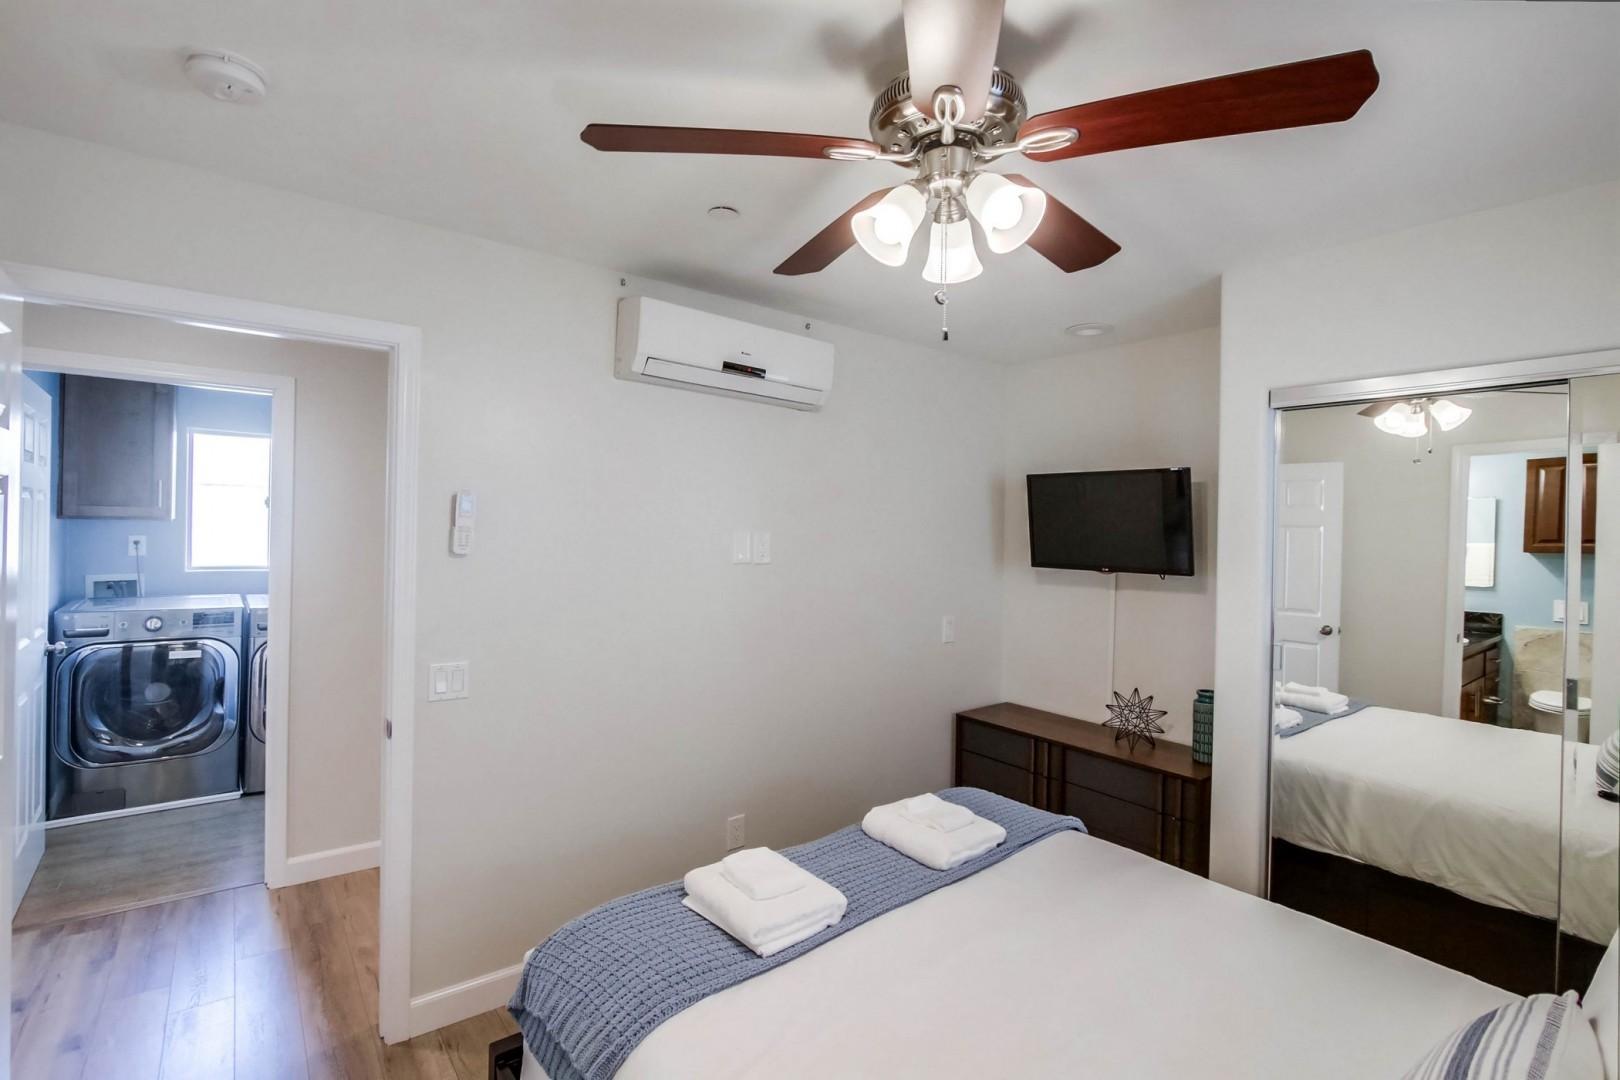 Bedroom 2 with flat-screen TV